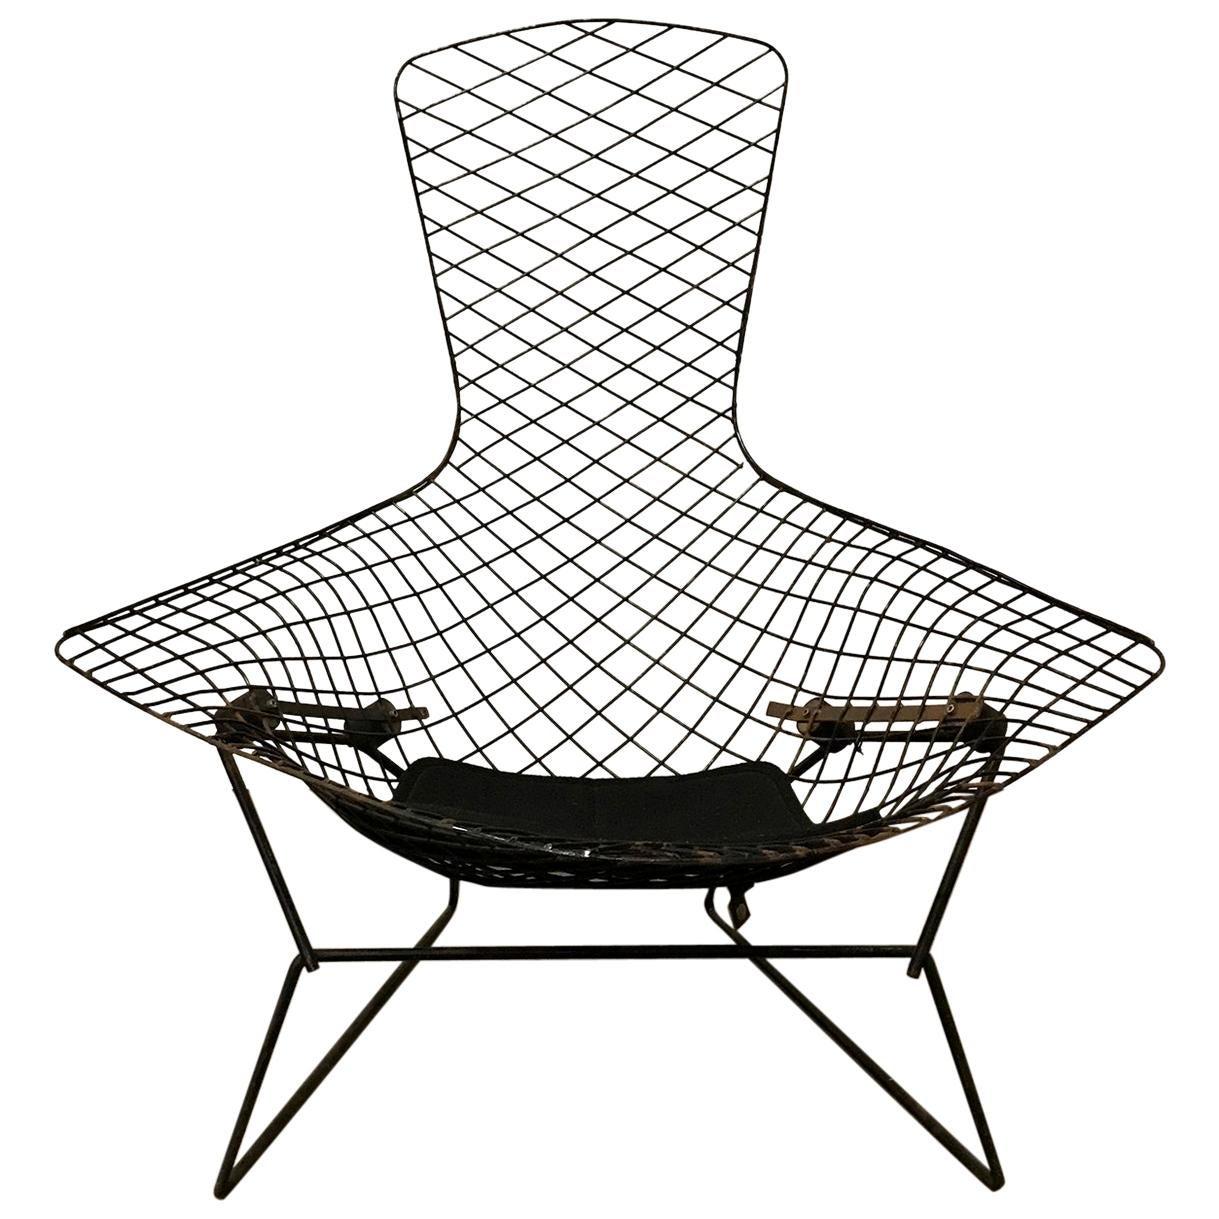 richard schultz garden lounge chair knoll international 1966 for Eastlake Bedroom Furniture richard schultz garden lounge chair knoll international 1966 for sale at 1stdibs